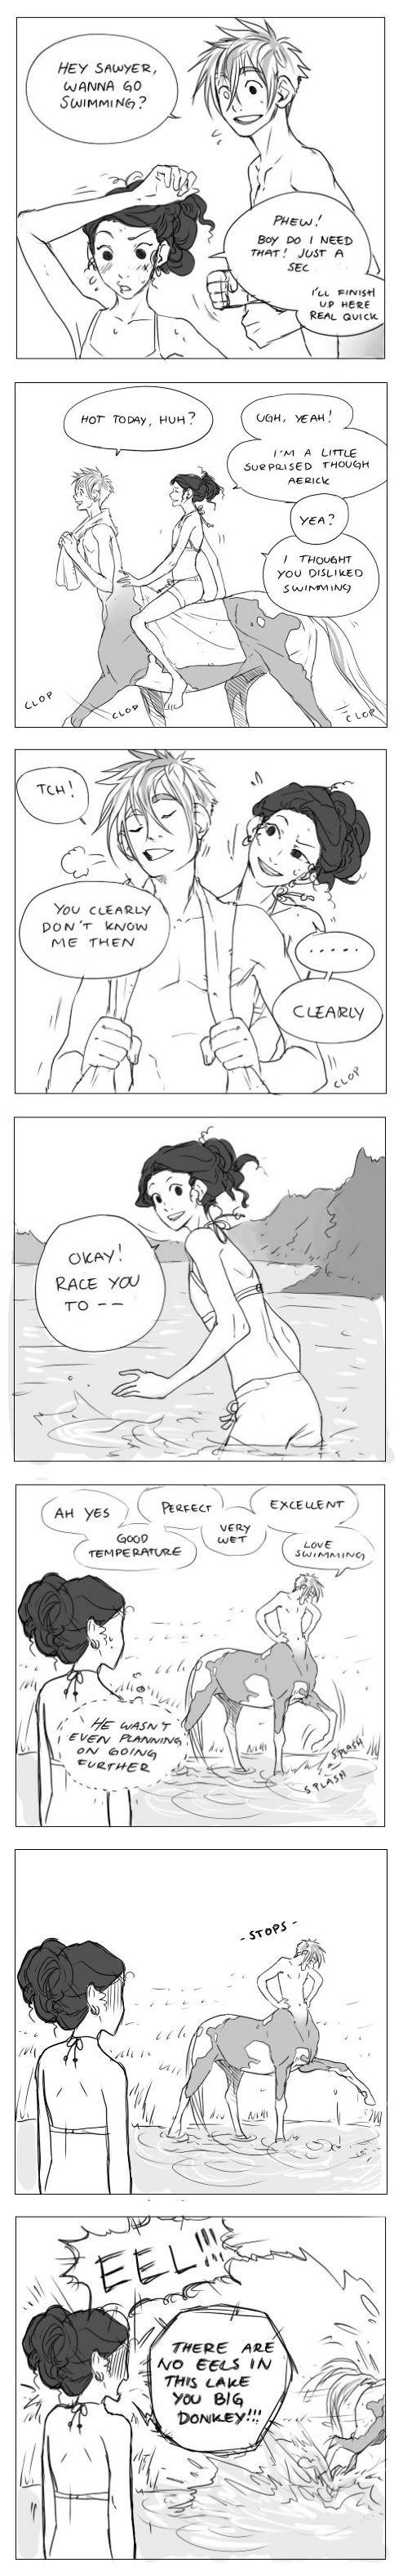 "hubedihubbe (""Swimming"" comic)"